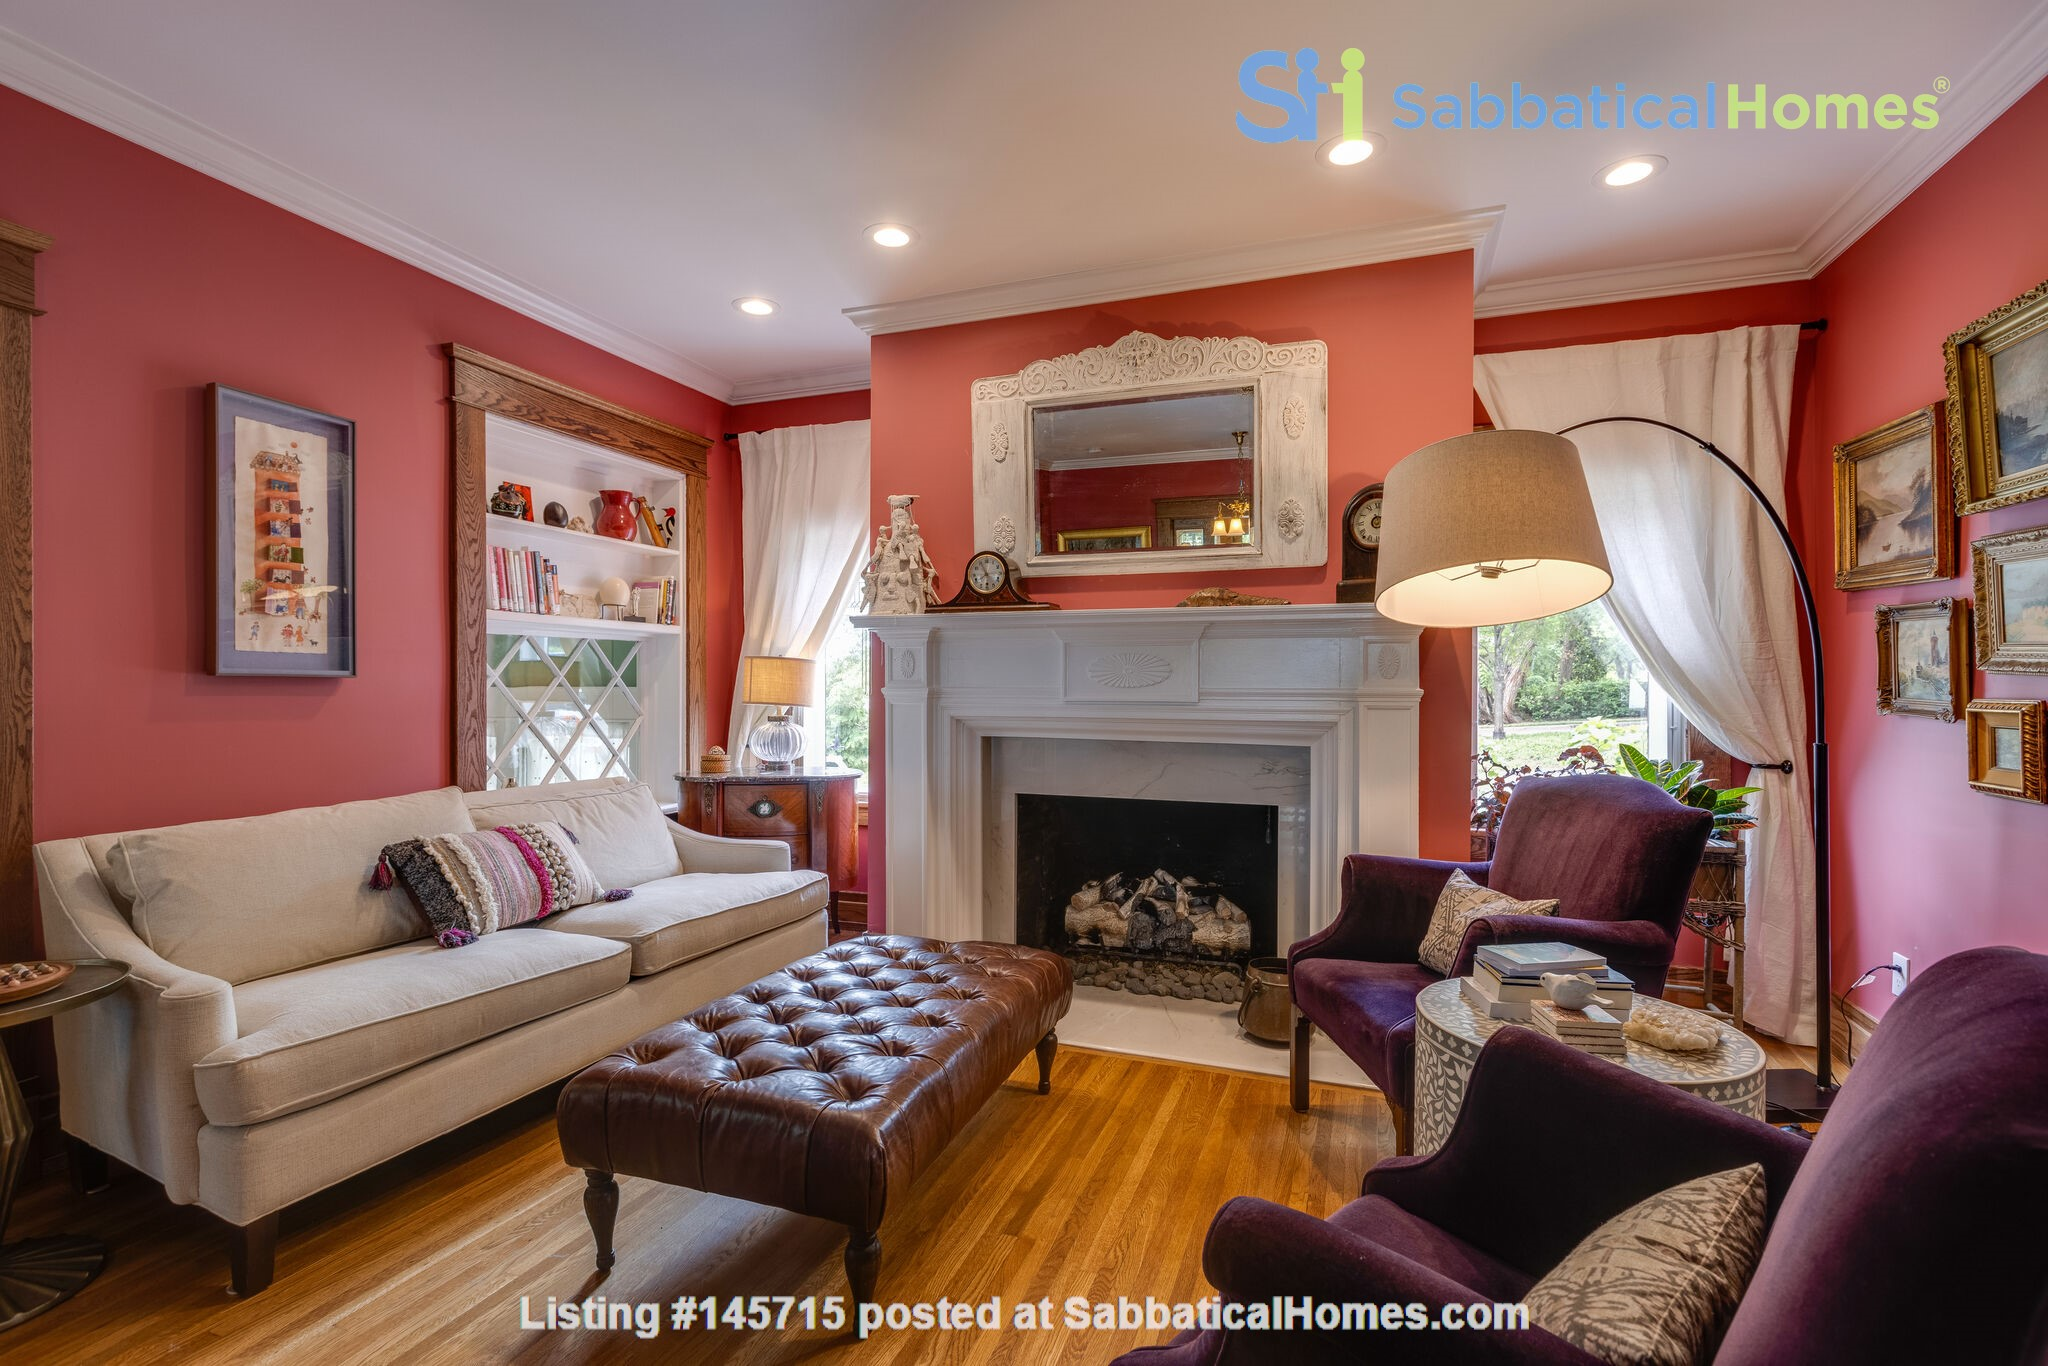 5 BR/3 + 2 BA Historic gem in Belmont-Hillsboro Home Rental in Nashville 3